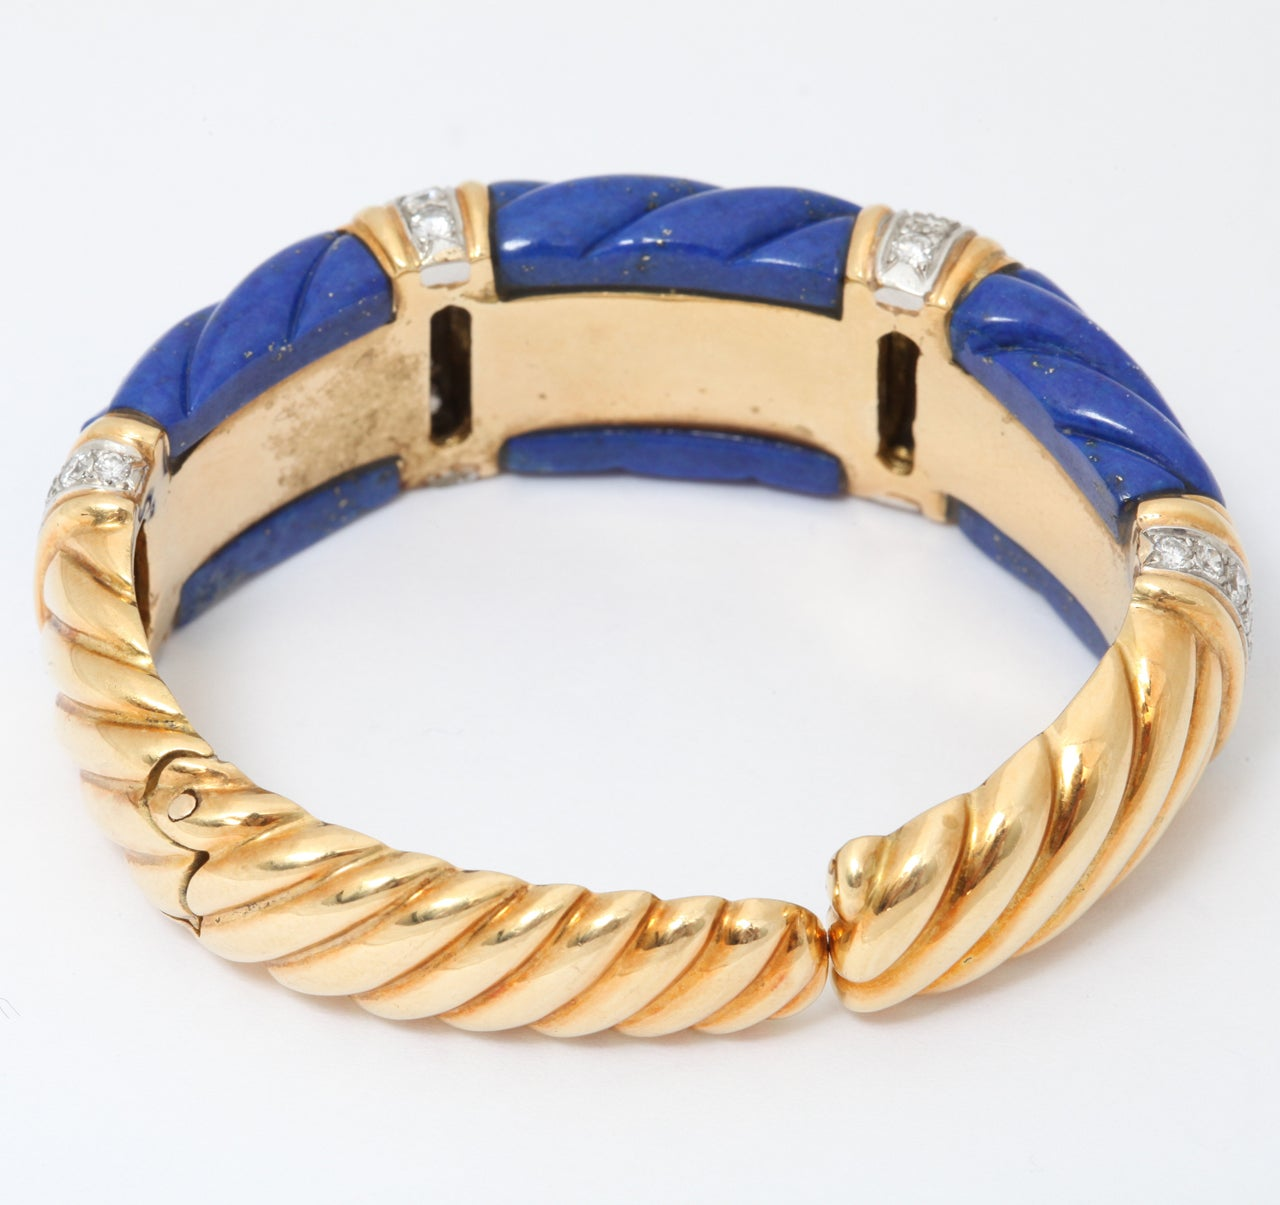 charles turi lapis lazuli gold and diamond cuff bracelet. Black Bedroom Furniture Sets. Home Design Ideas